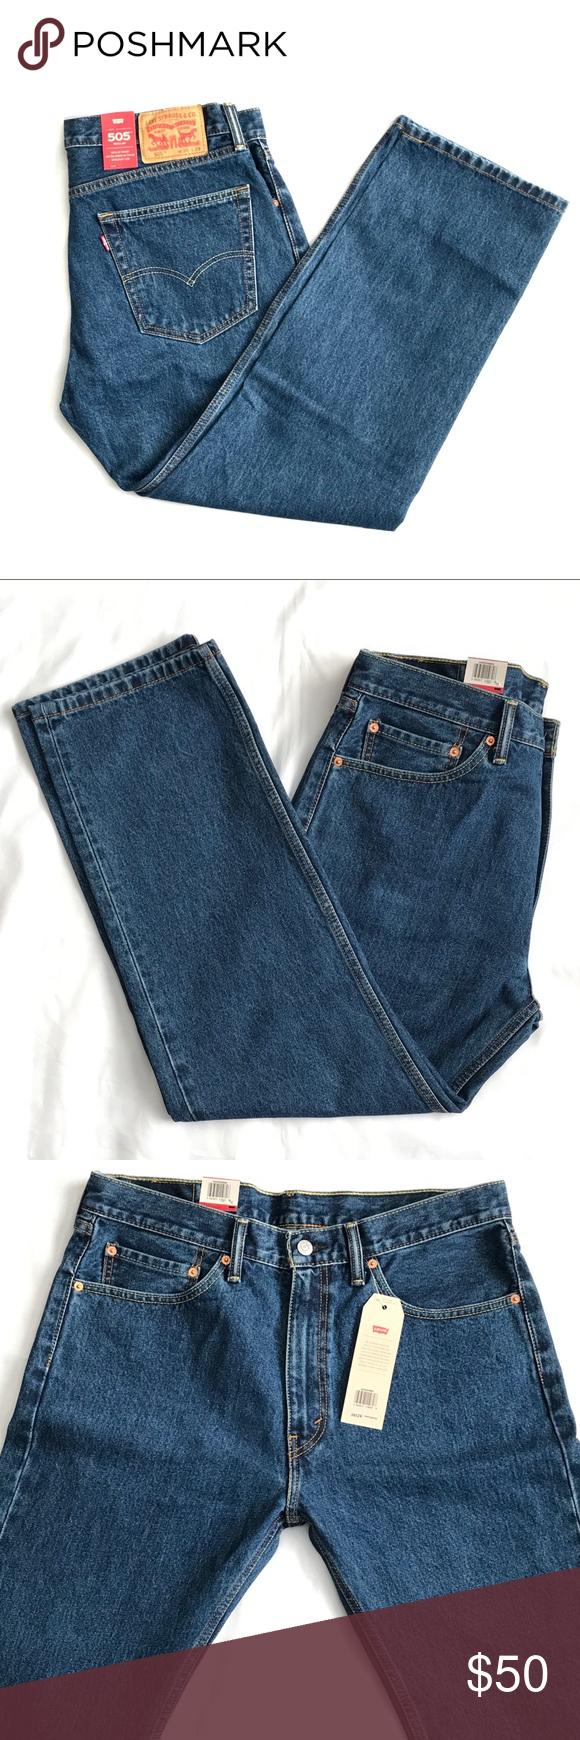 3ab290b5 Levis 505 Regular Fit Straight Leg Jeans Dark 36 Levi's 505 Dark Stonewash  Mens Size 38 x 30 Waist - 36